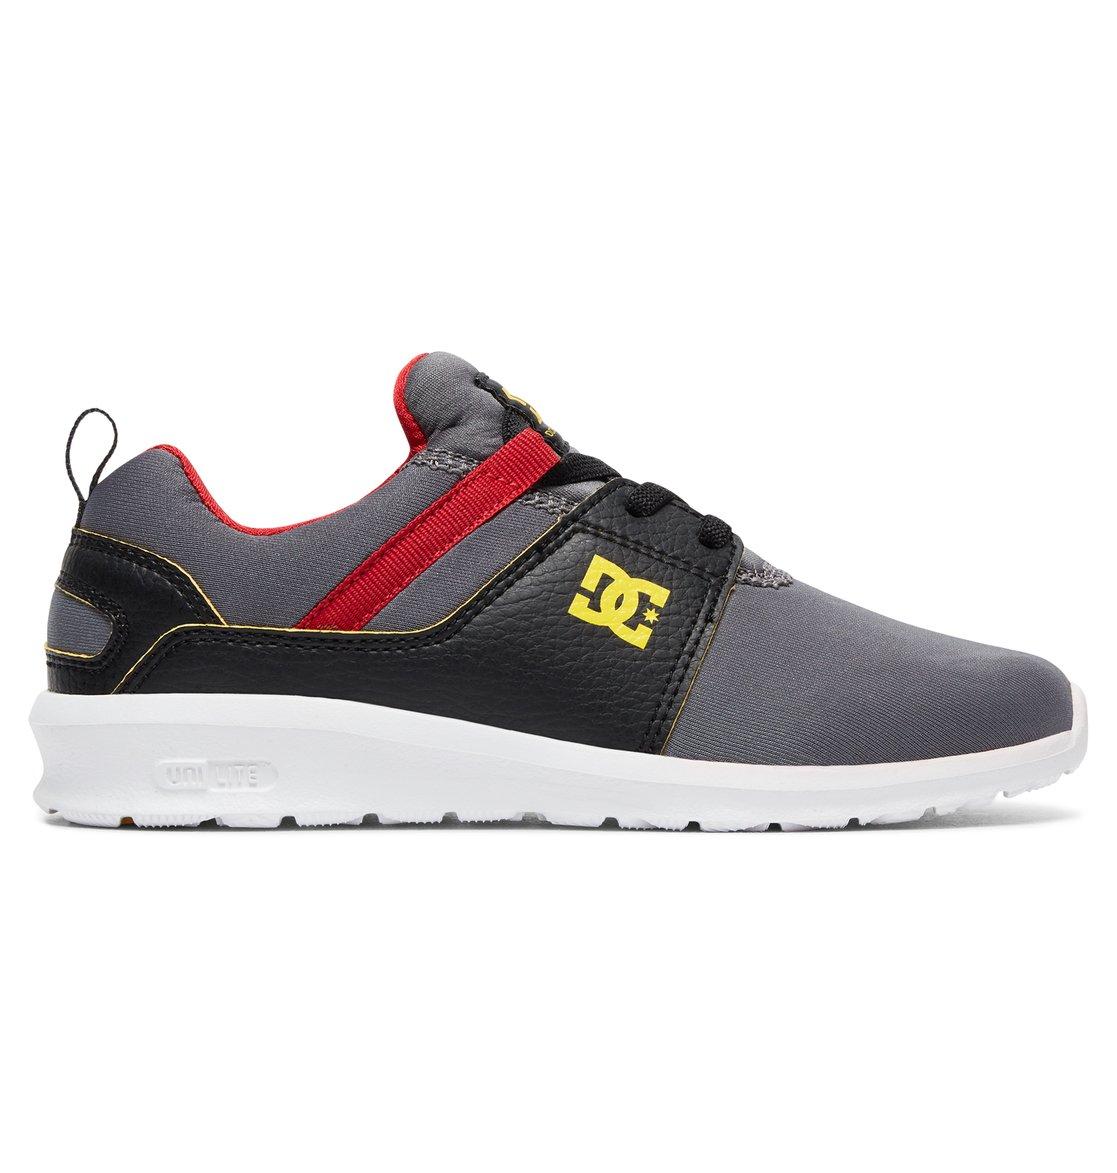 Chaussures DC Shoes Heathrow SE grises homme